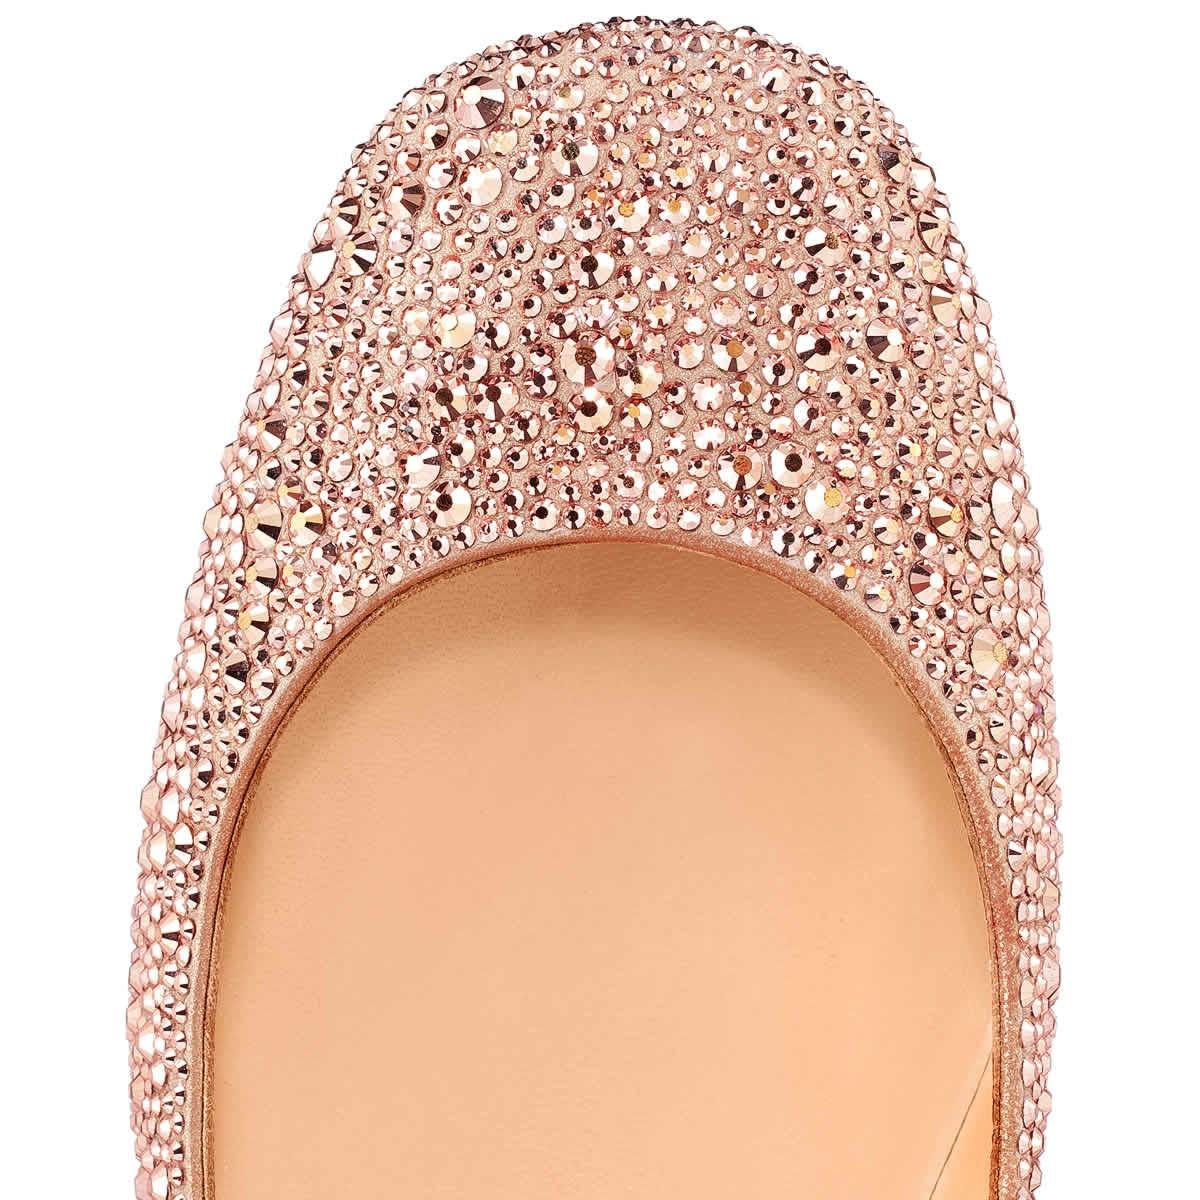 knockoff louis vuitton shoes - Shoeniverse: The Christian Louboutin flat shoes roundup featuring ...